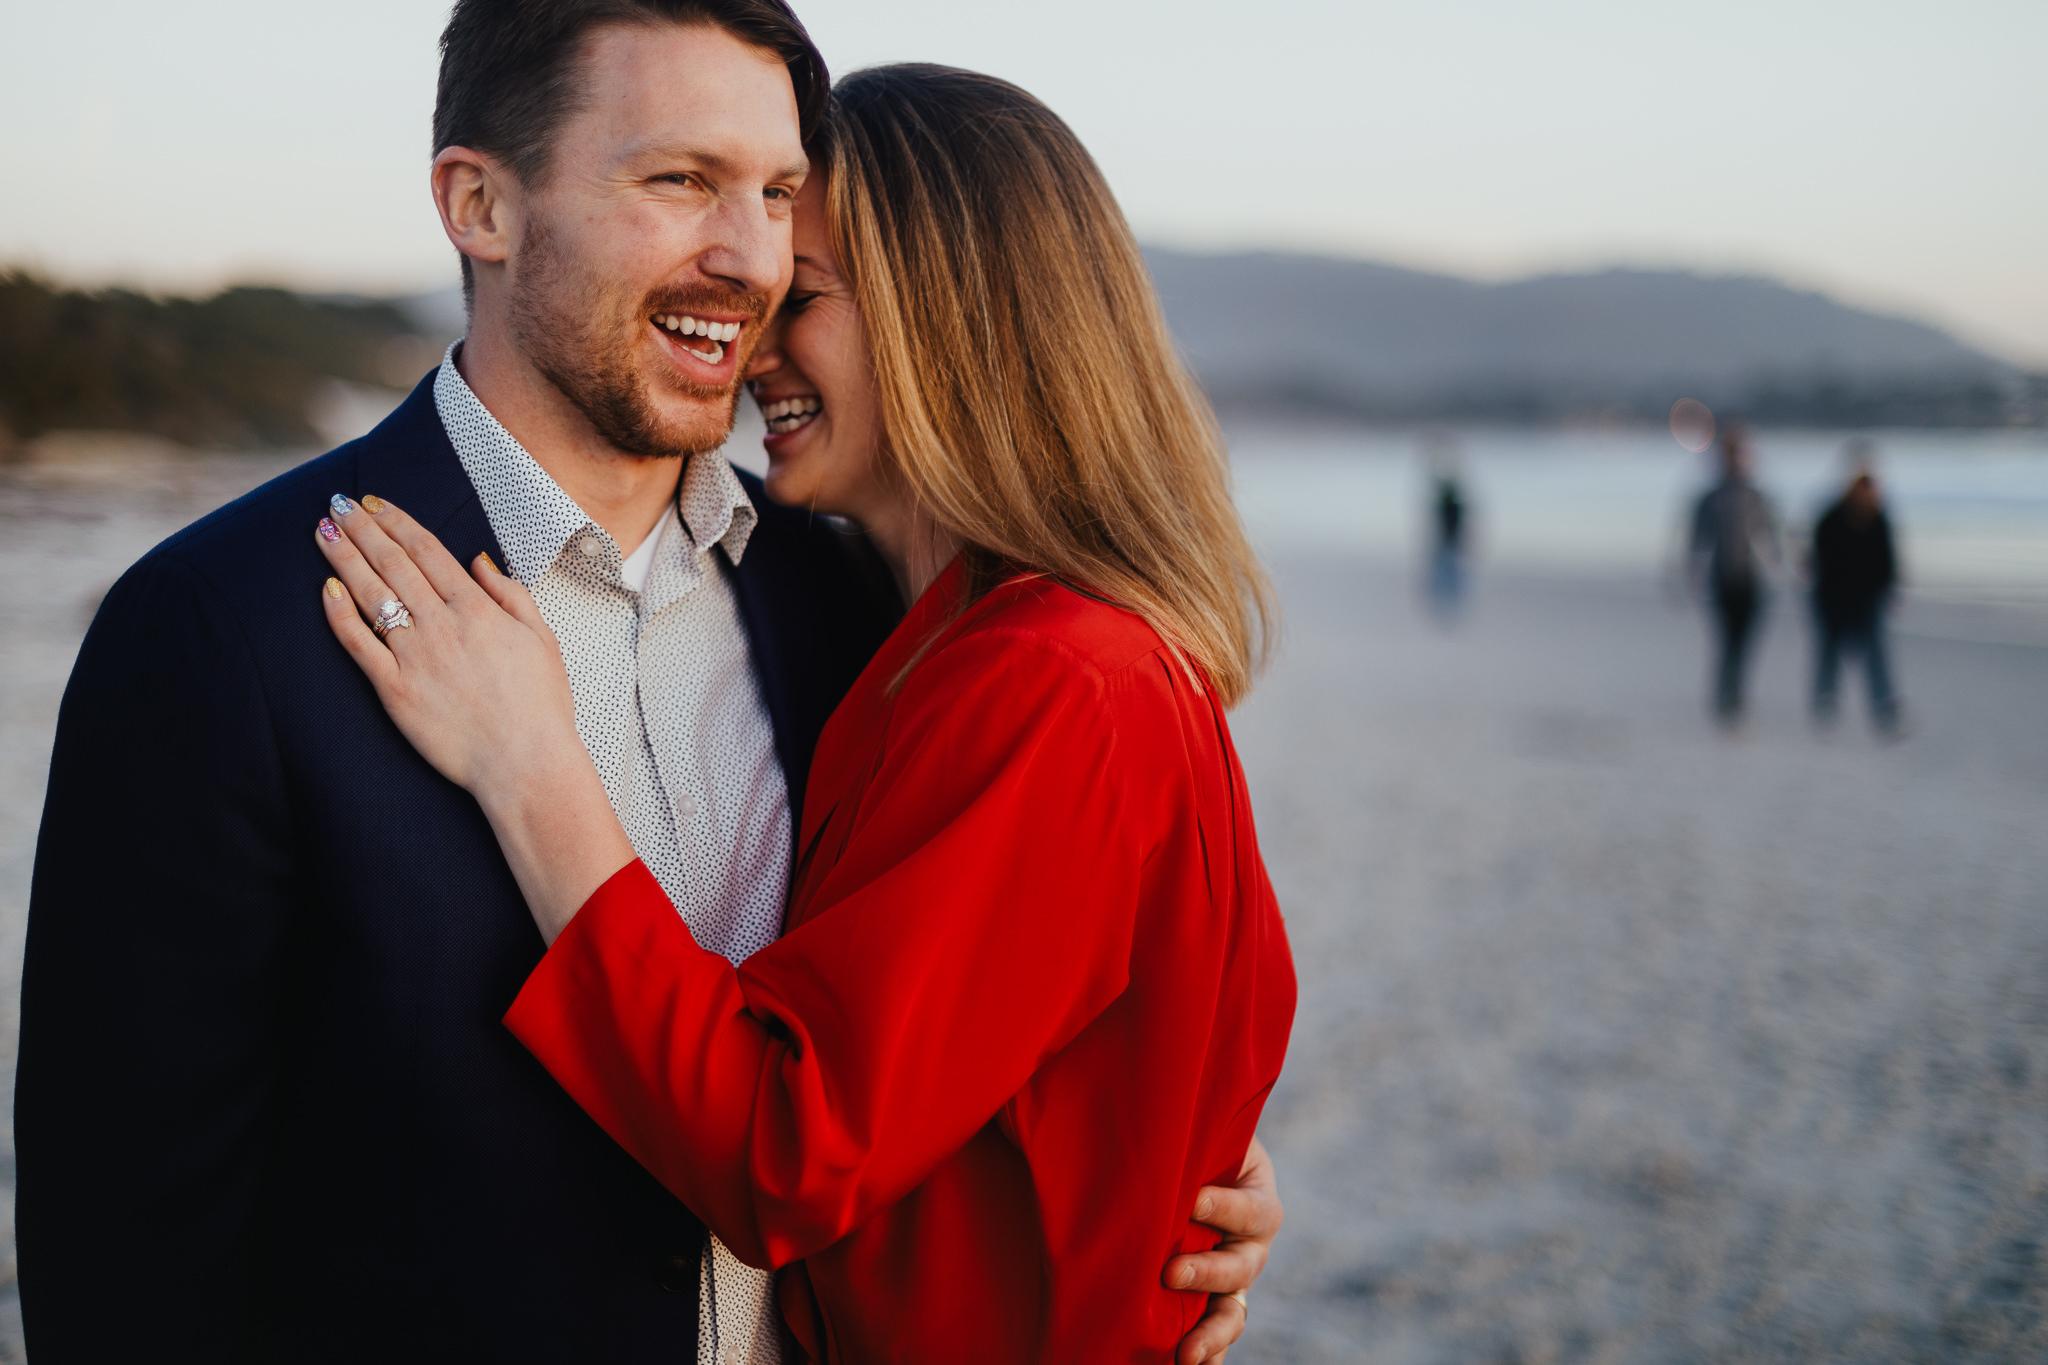 Archer Inspired Photography Carmel Beach California Wedding Engagement Lifestyle Anniversary Natural Light Photographer-95.jpg